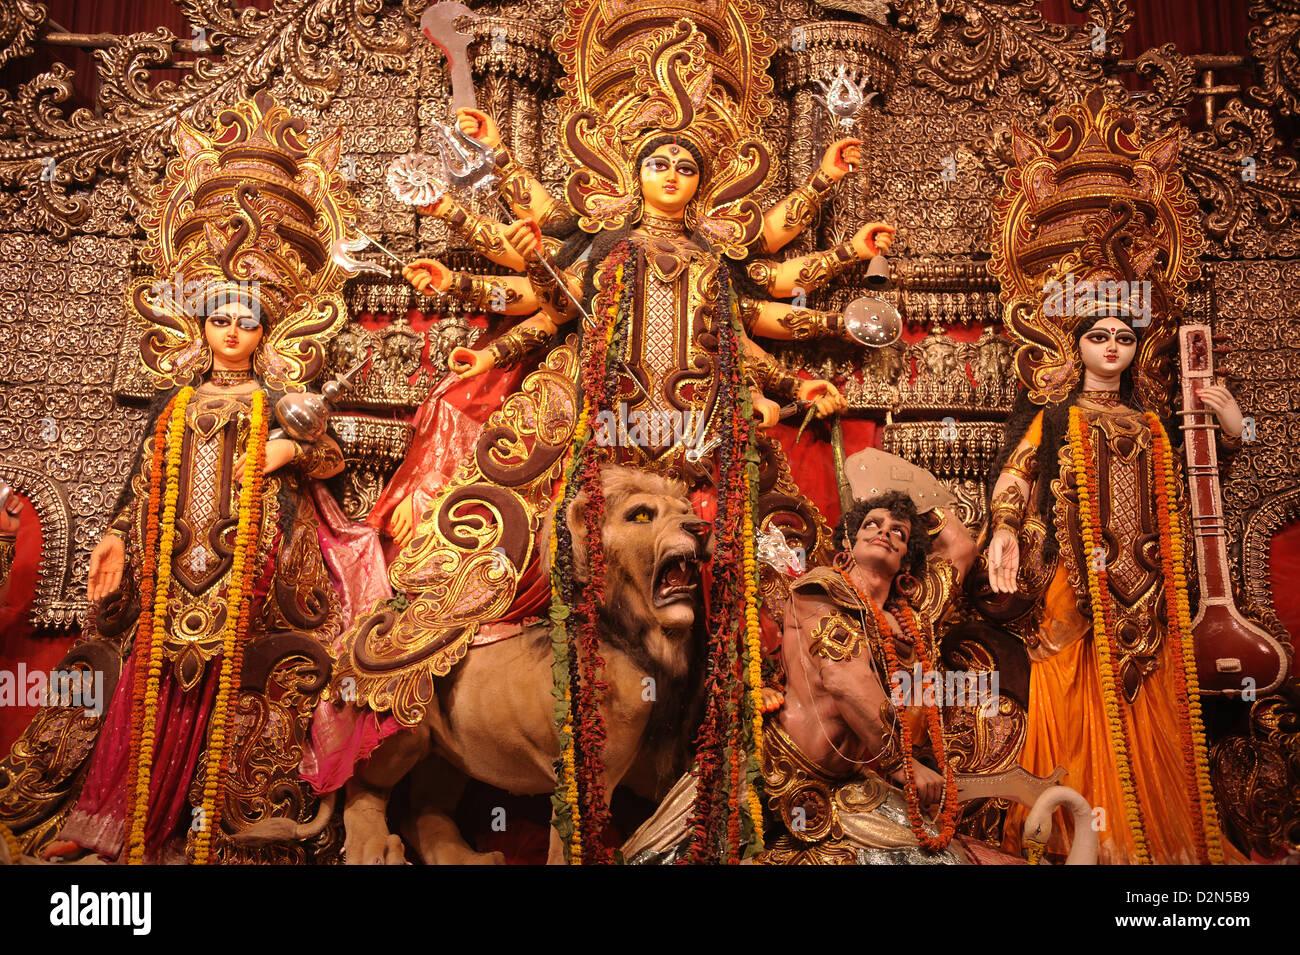 Goddess Durga statue during Durga Pooja, Kolkata, West Bengal, India, Asia - Stock Image